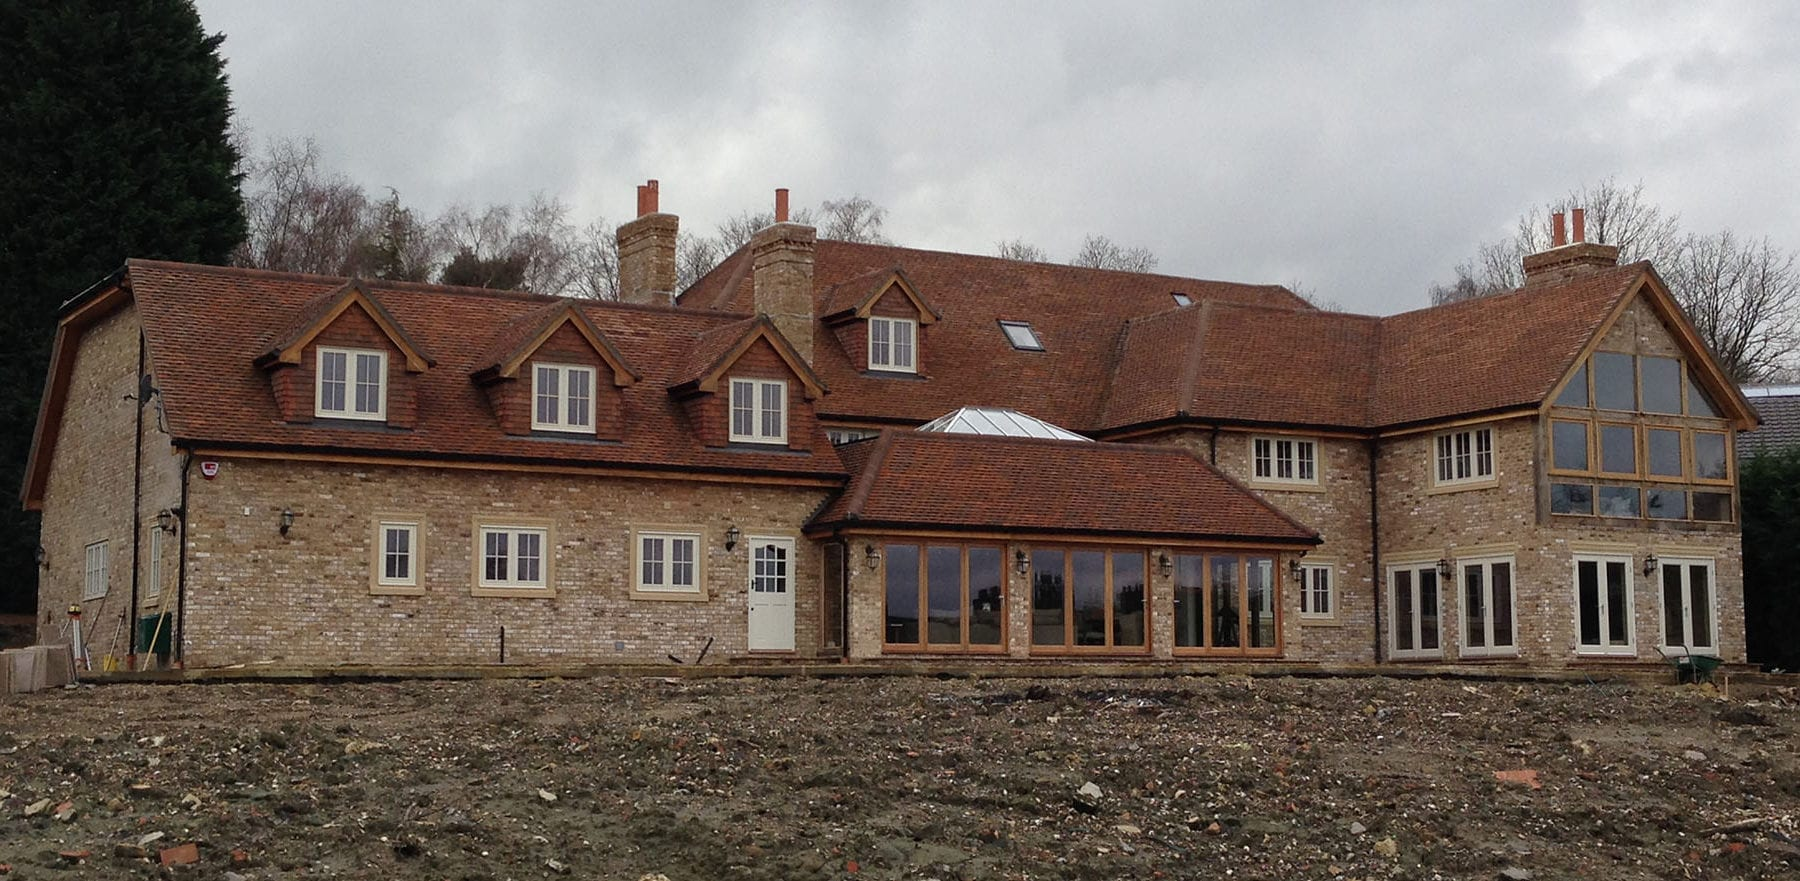 Lifestiles - Handmade Brown Clay Roof Tiles - Sunningdale, England 3